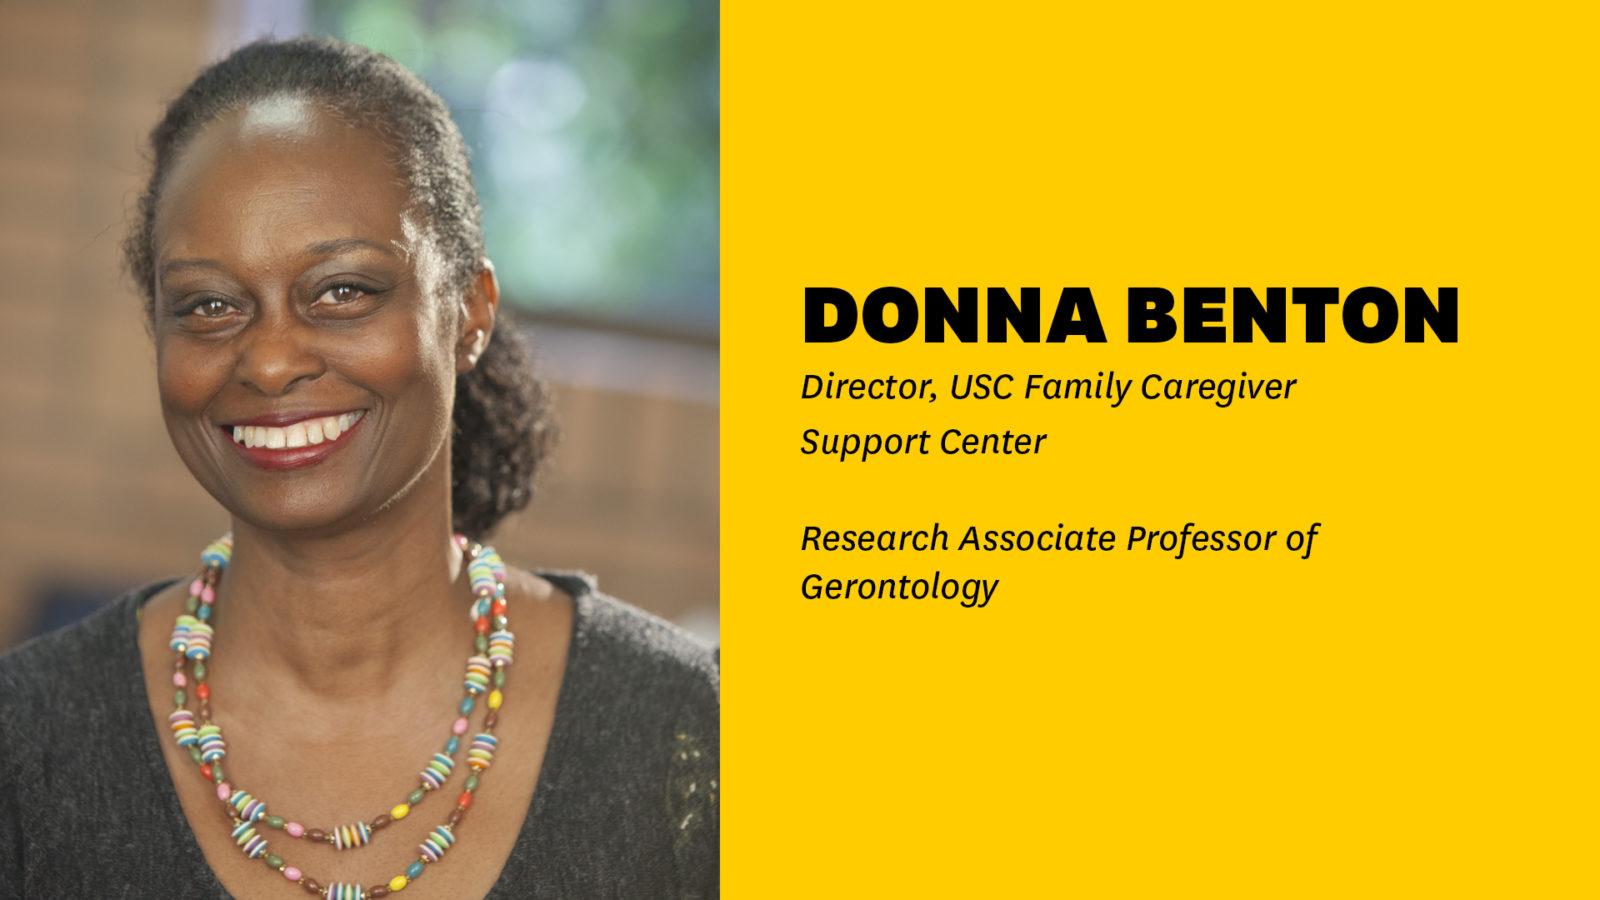 Donna Benton, Director USC Family Caregiver Support Center